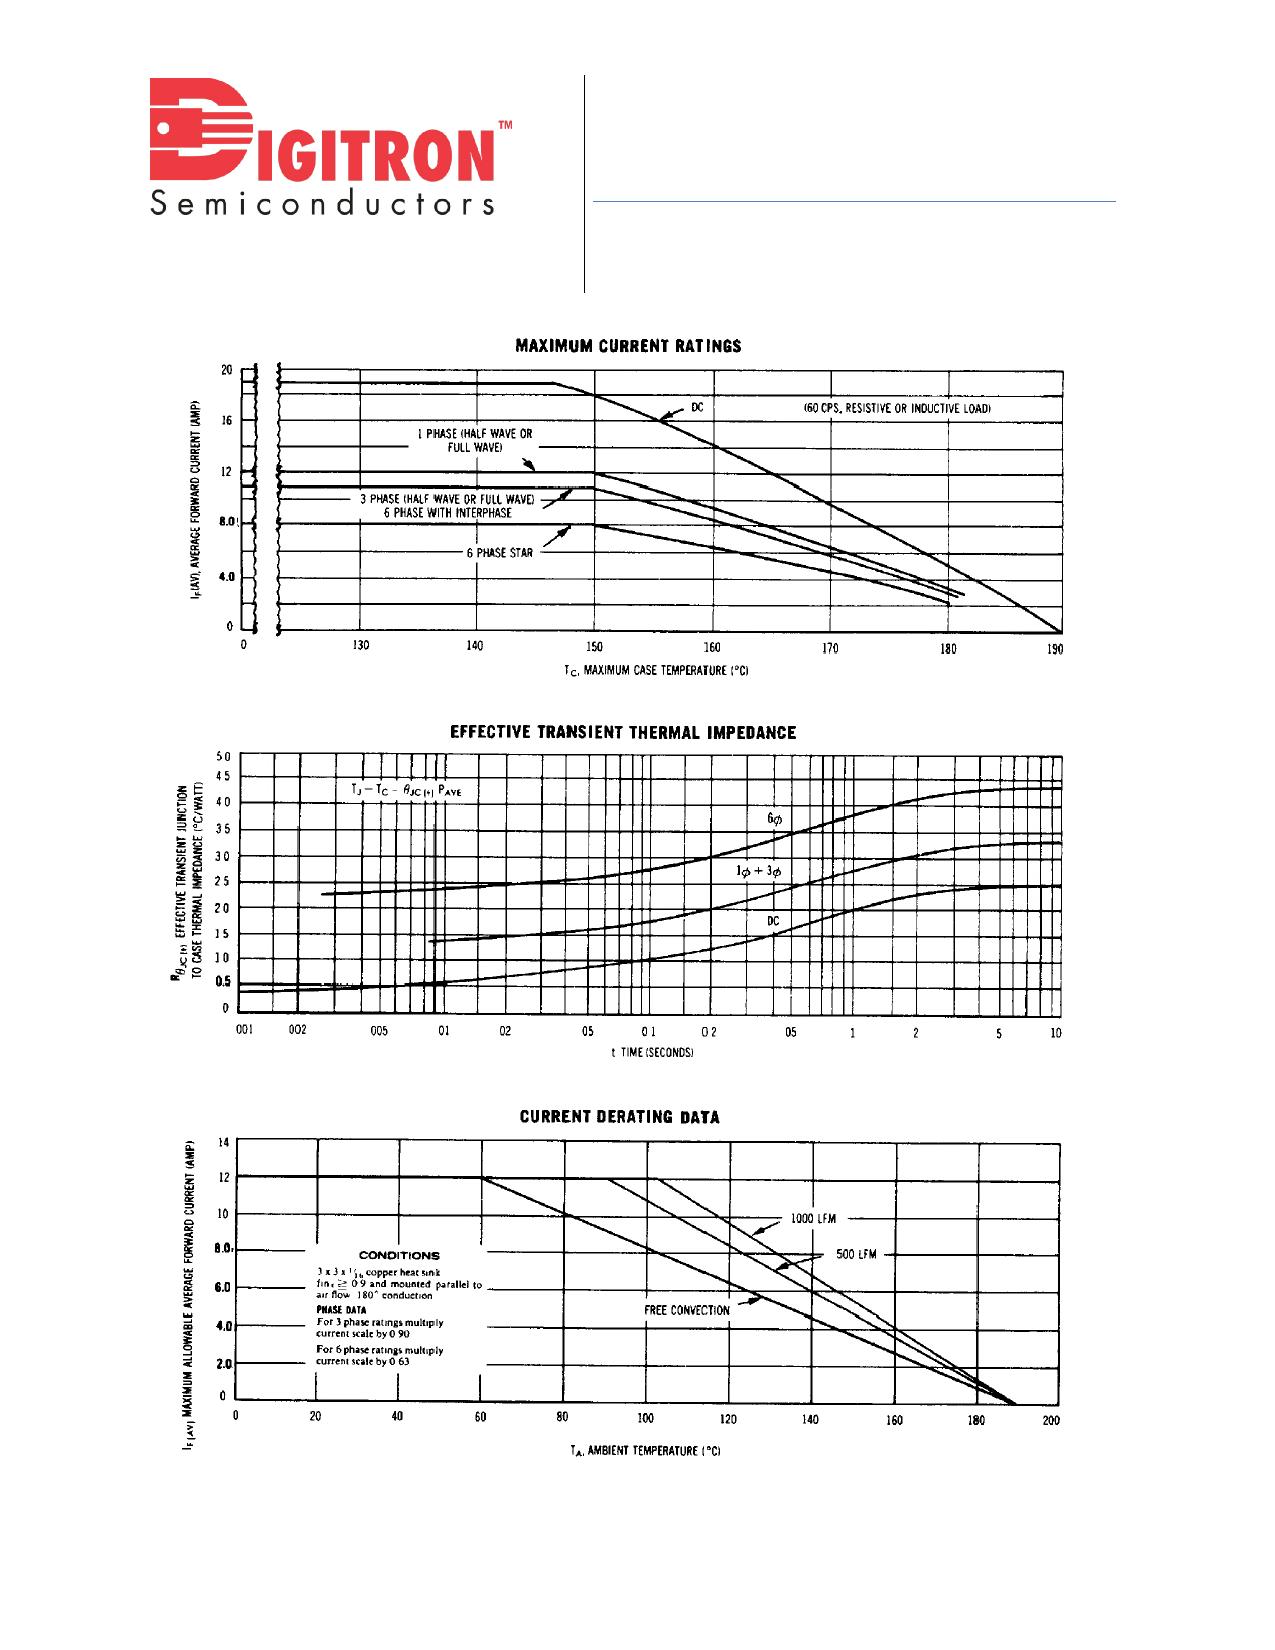 MR1124 pdf, 반도체, 판매, 대치품